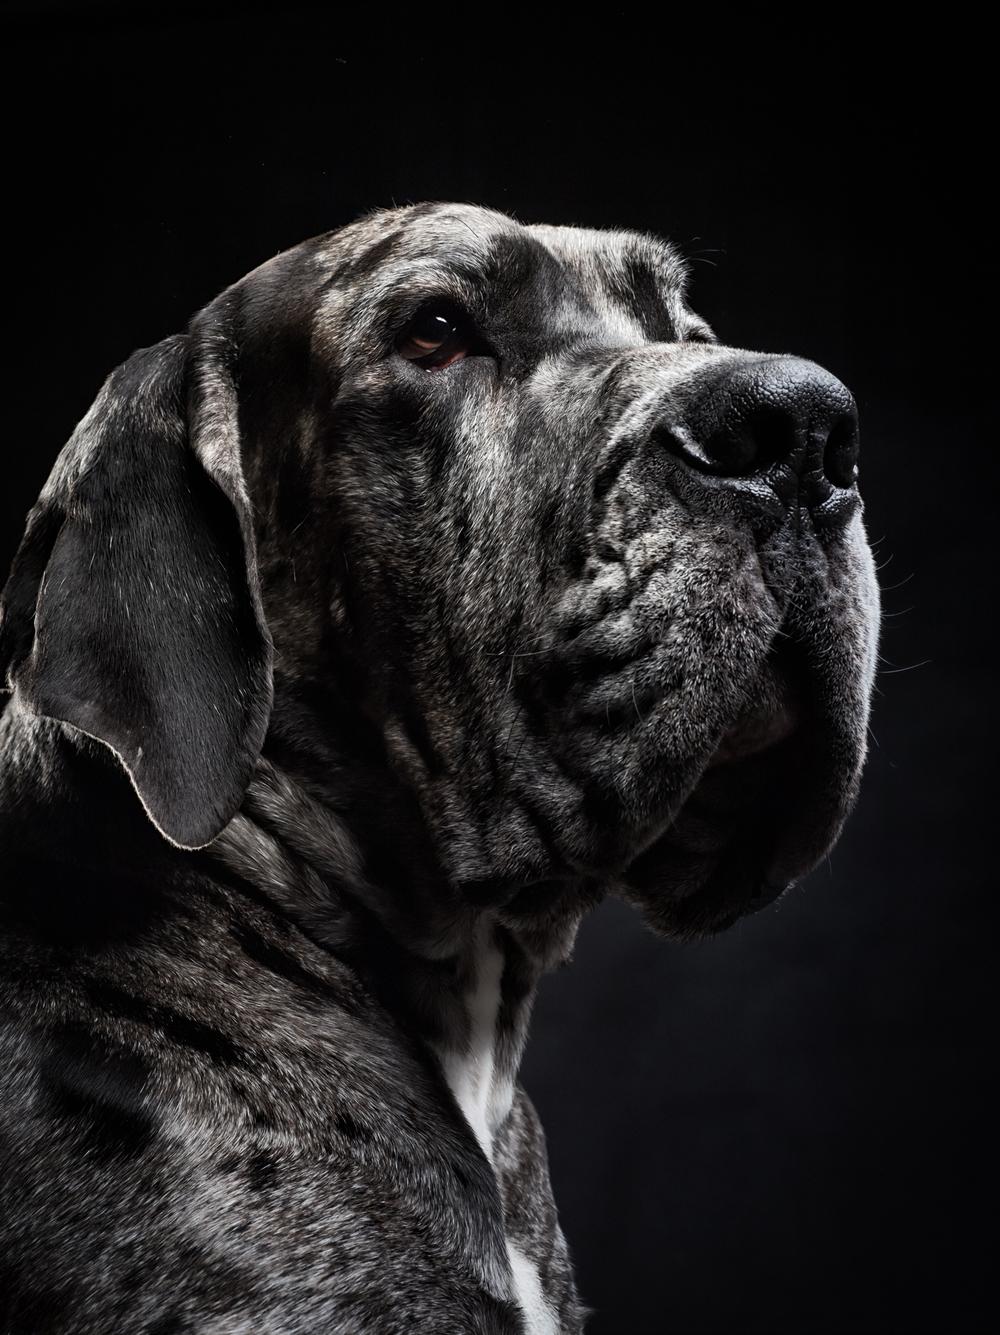 klaus-dyba-dog-photography-great-dane